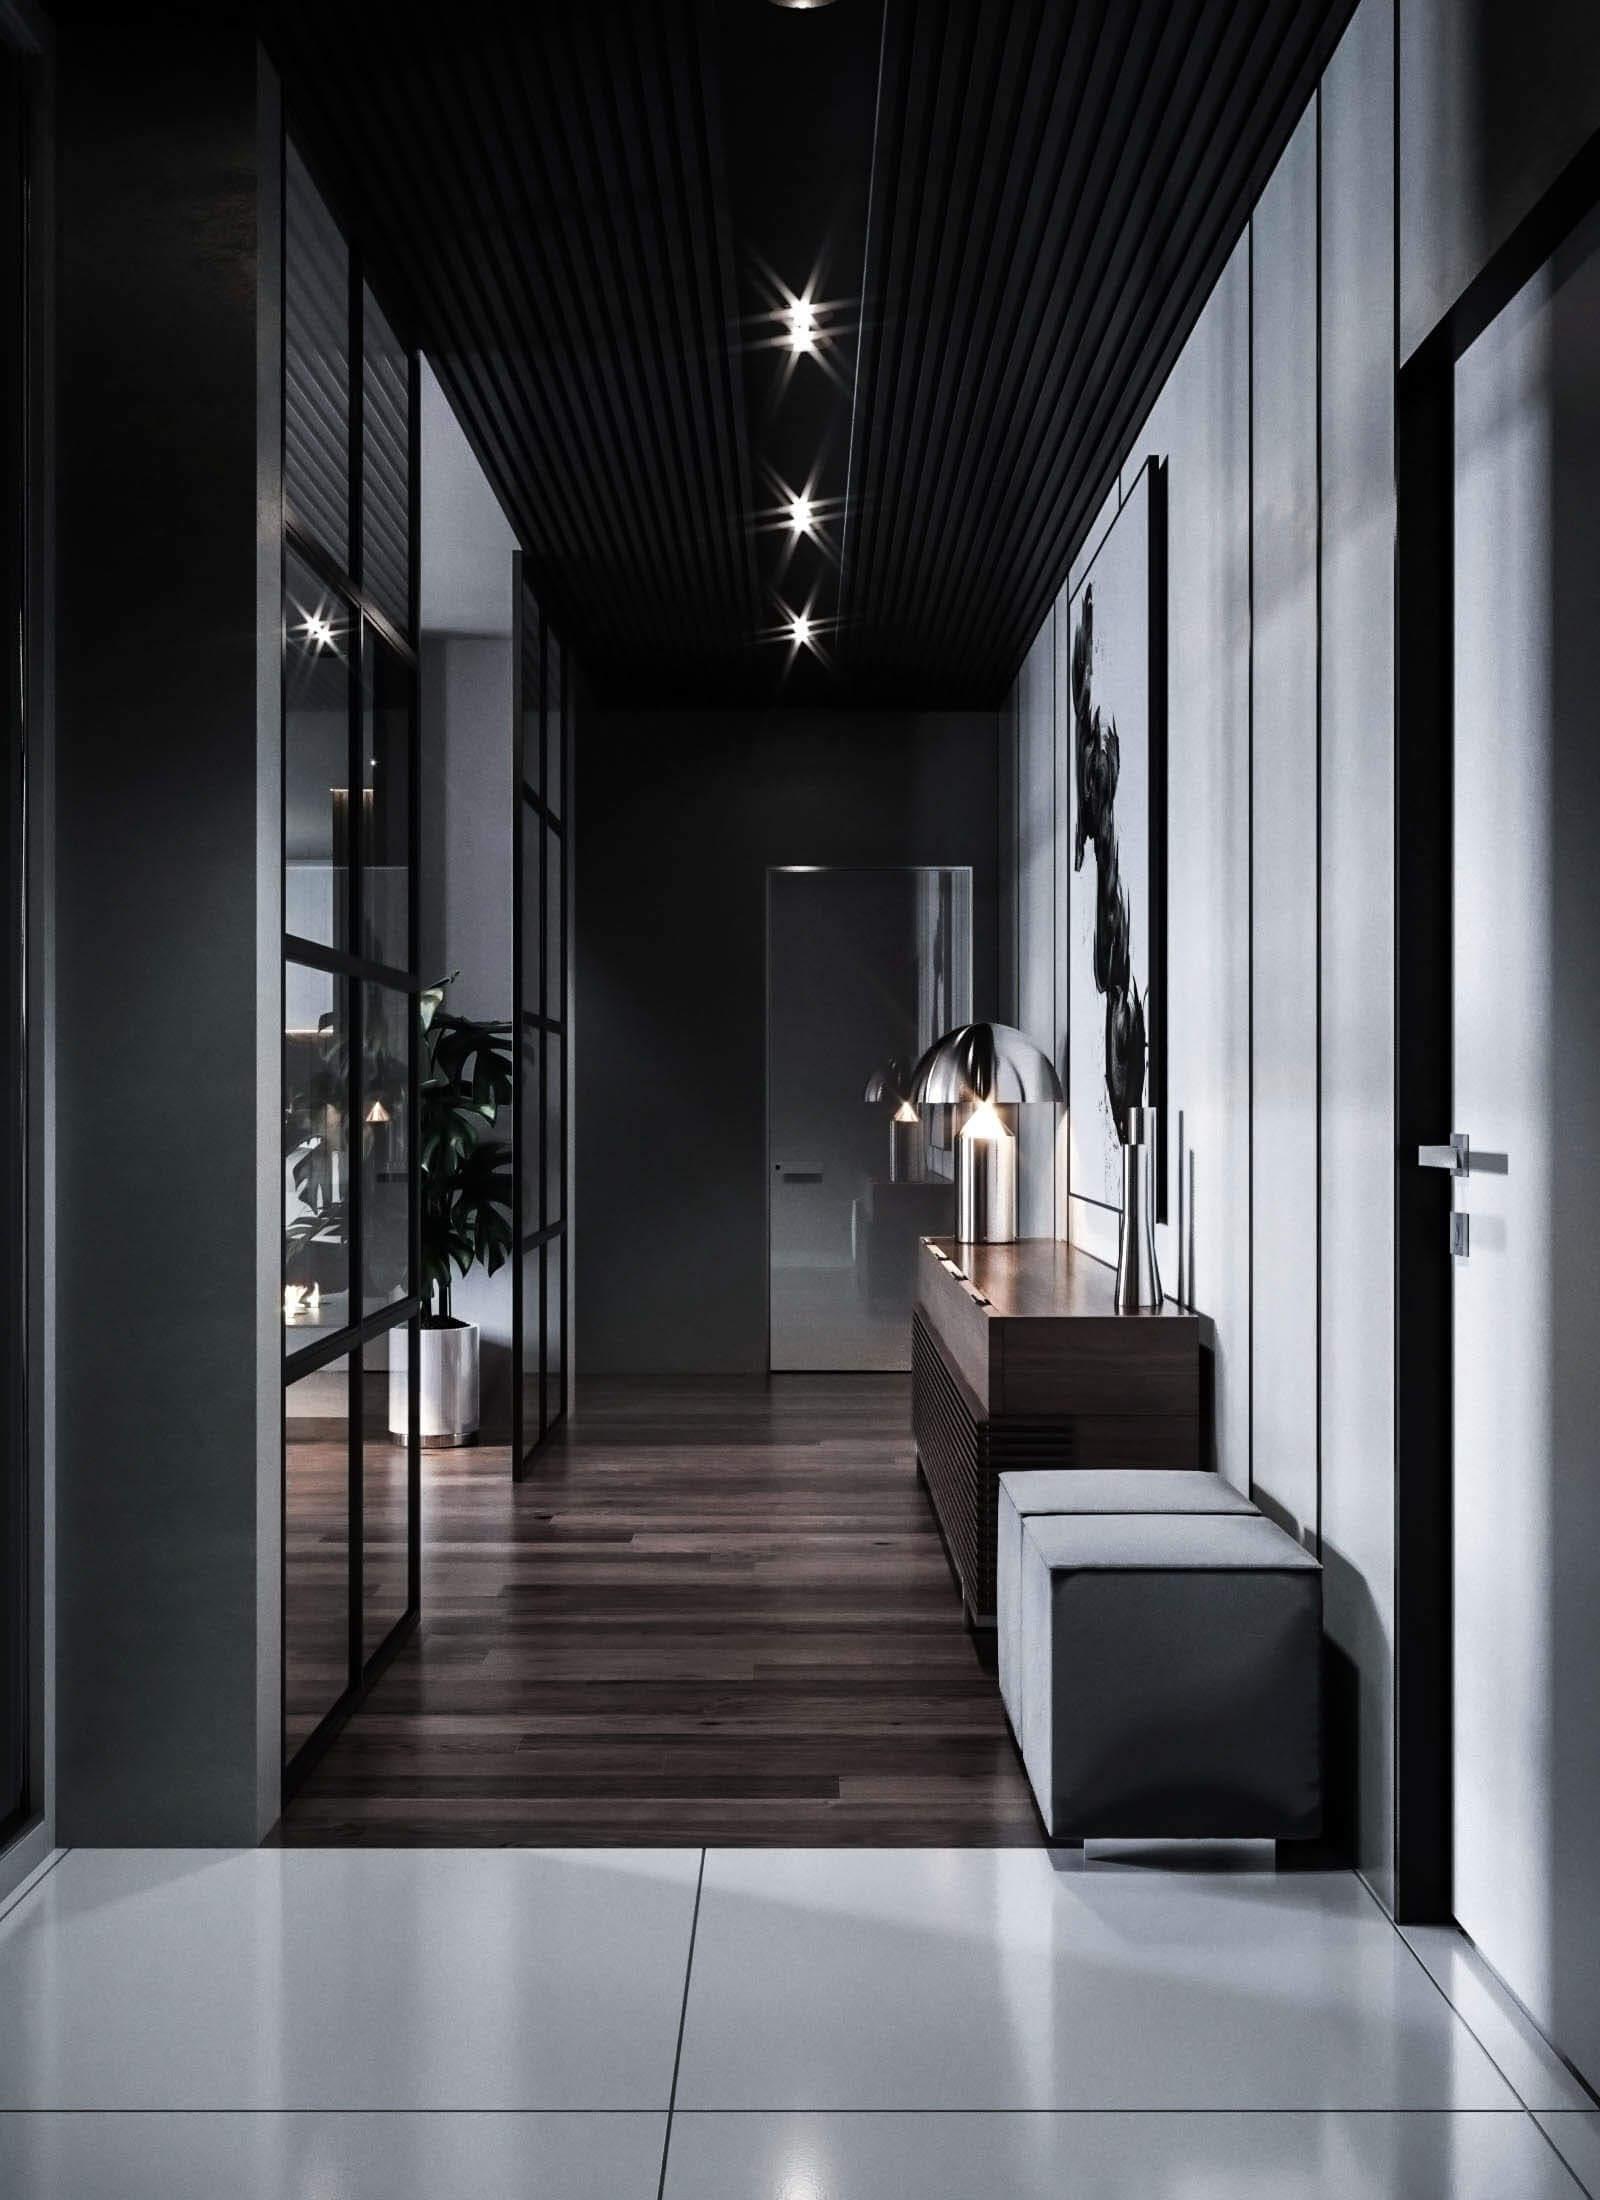 Dubrovka apartment entrance corridor - cgi visualization